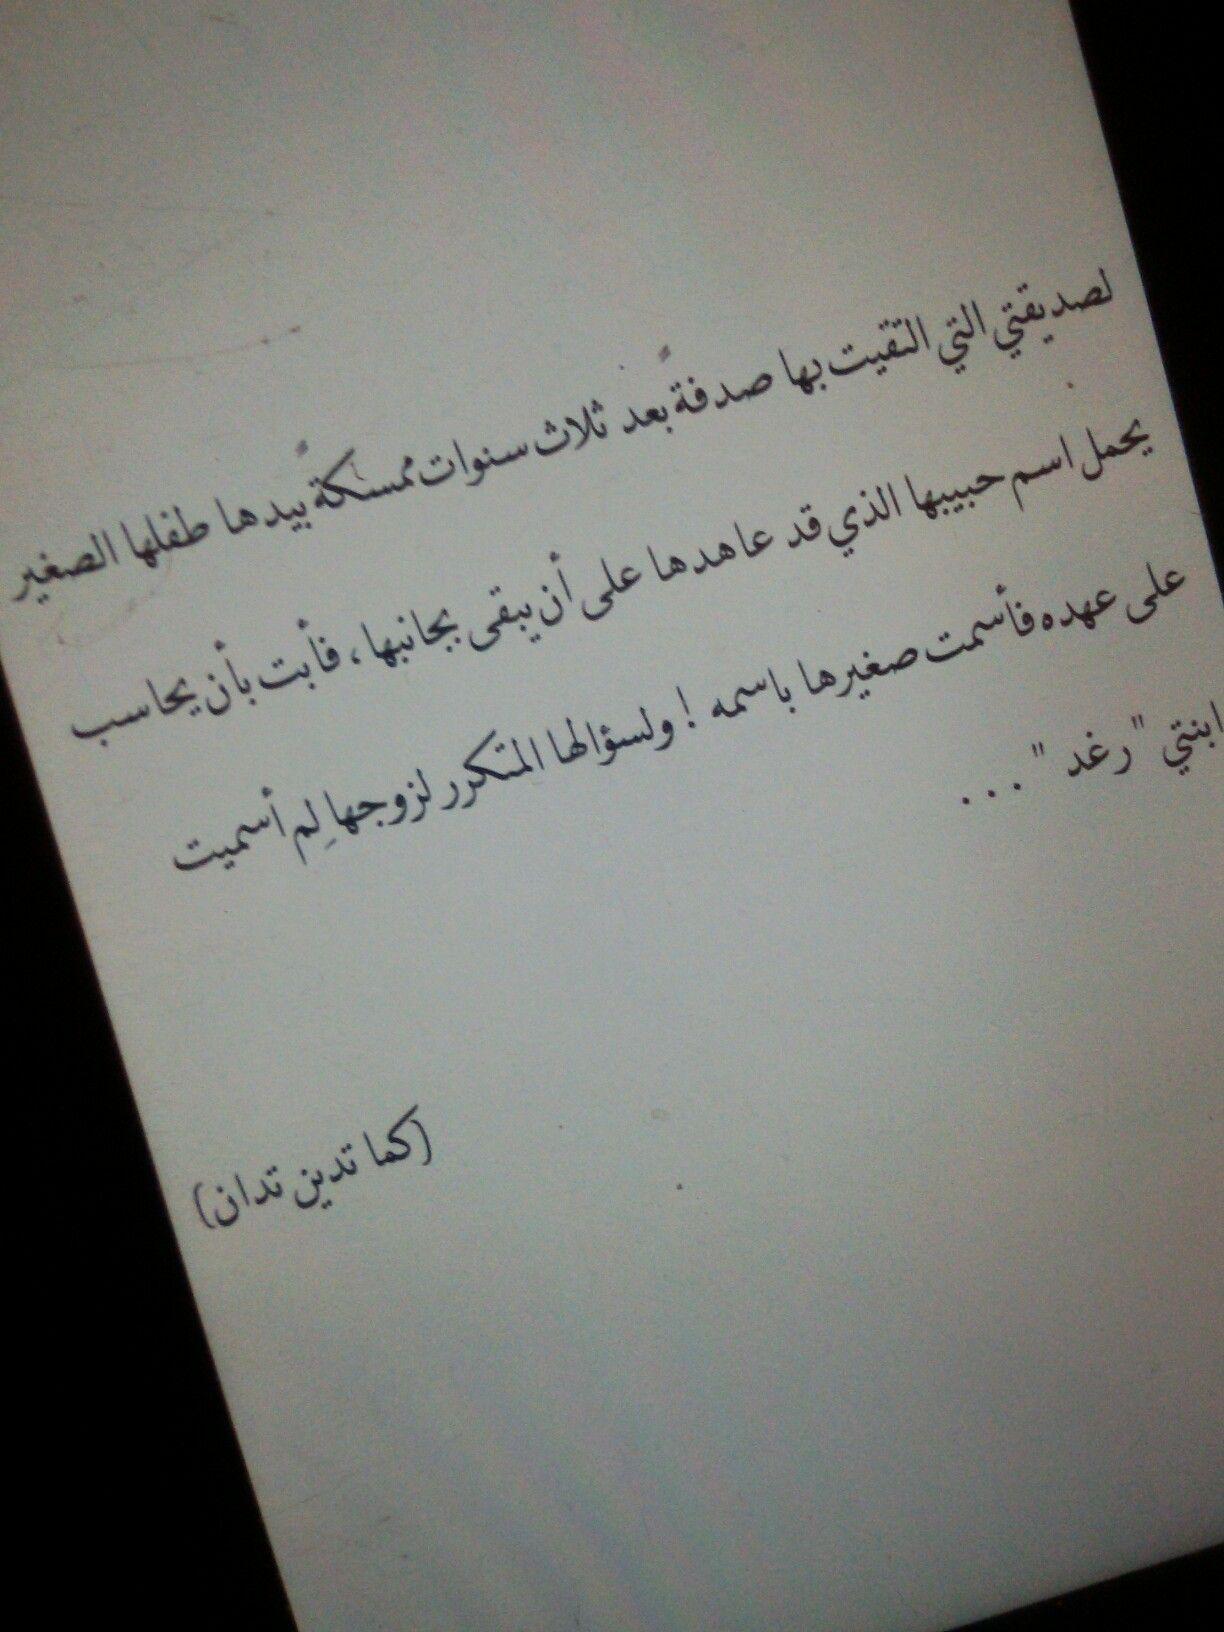 بداية مؤثرة كتاب شبهة هديل قاسم Tattoo Quotes Math Arabic Calligraphy